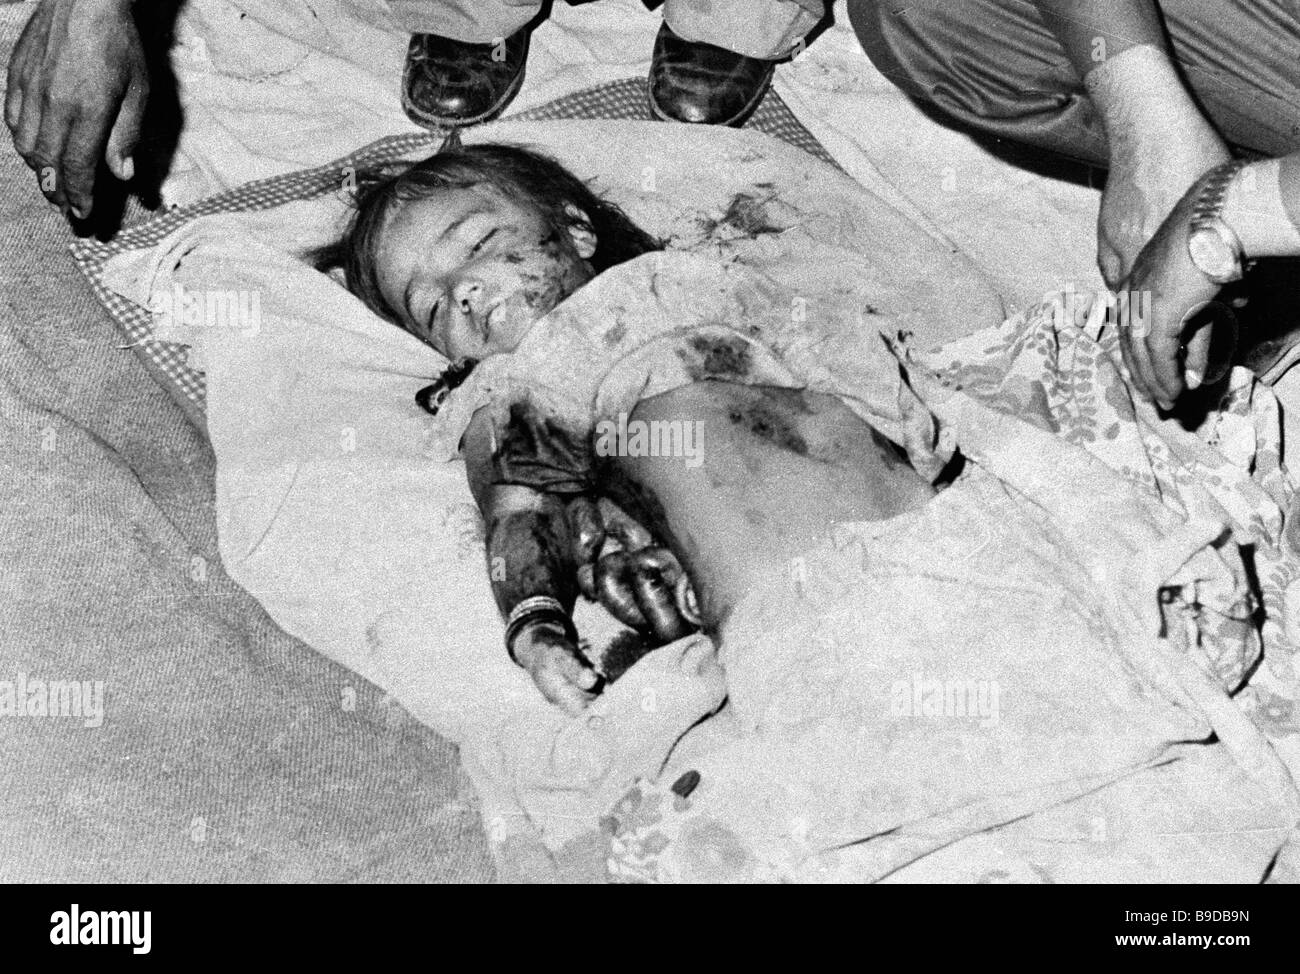 A child killed in extremist shelling of Baraki area - Stock Image